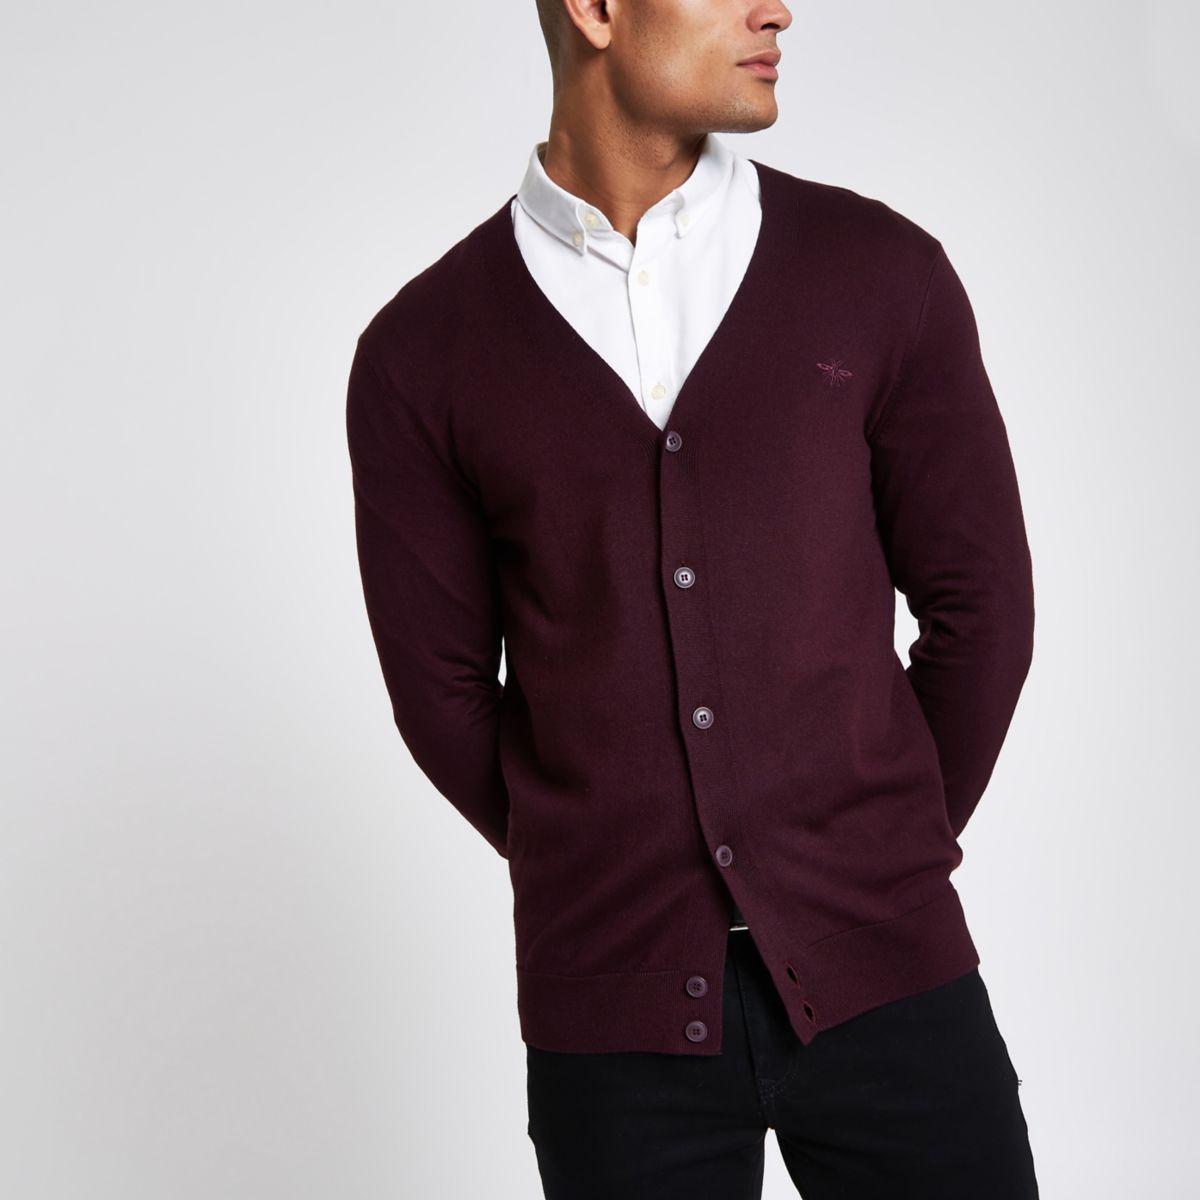 Dark red V neck button-up cardigan